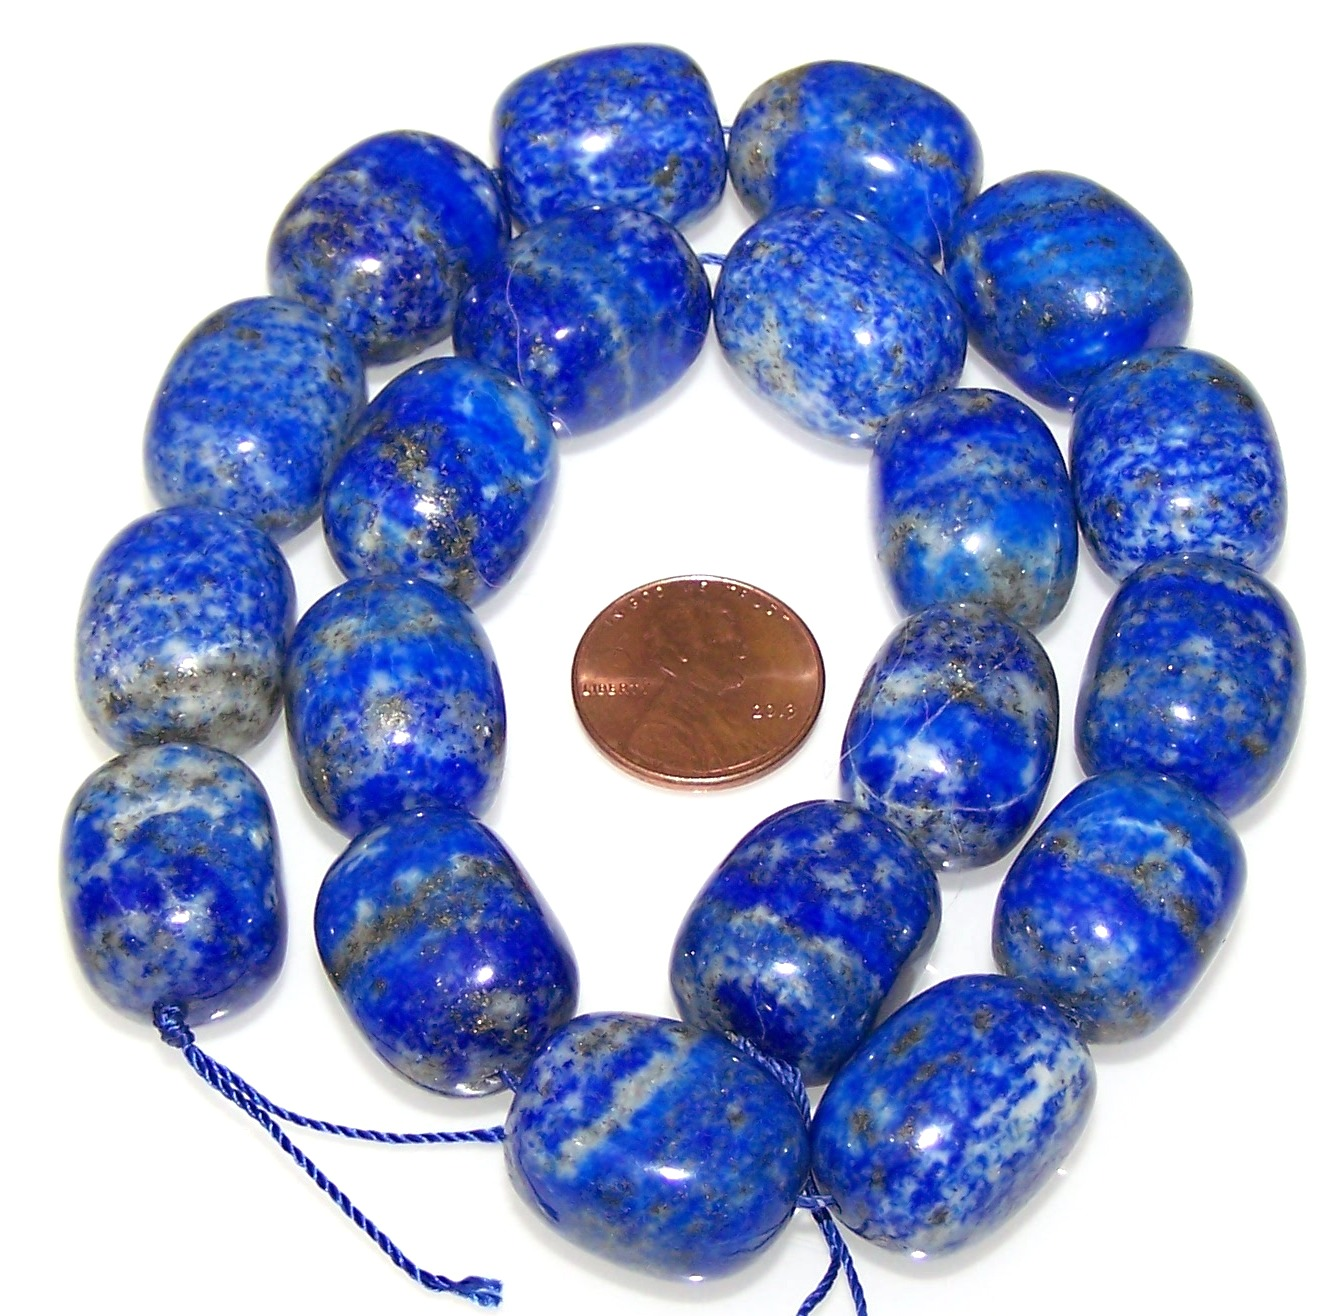 Lapis Lazuli Nuggets Lapis Lazuli Plain Smooth Nugget Beads Quality AAA